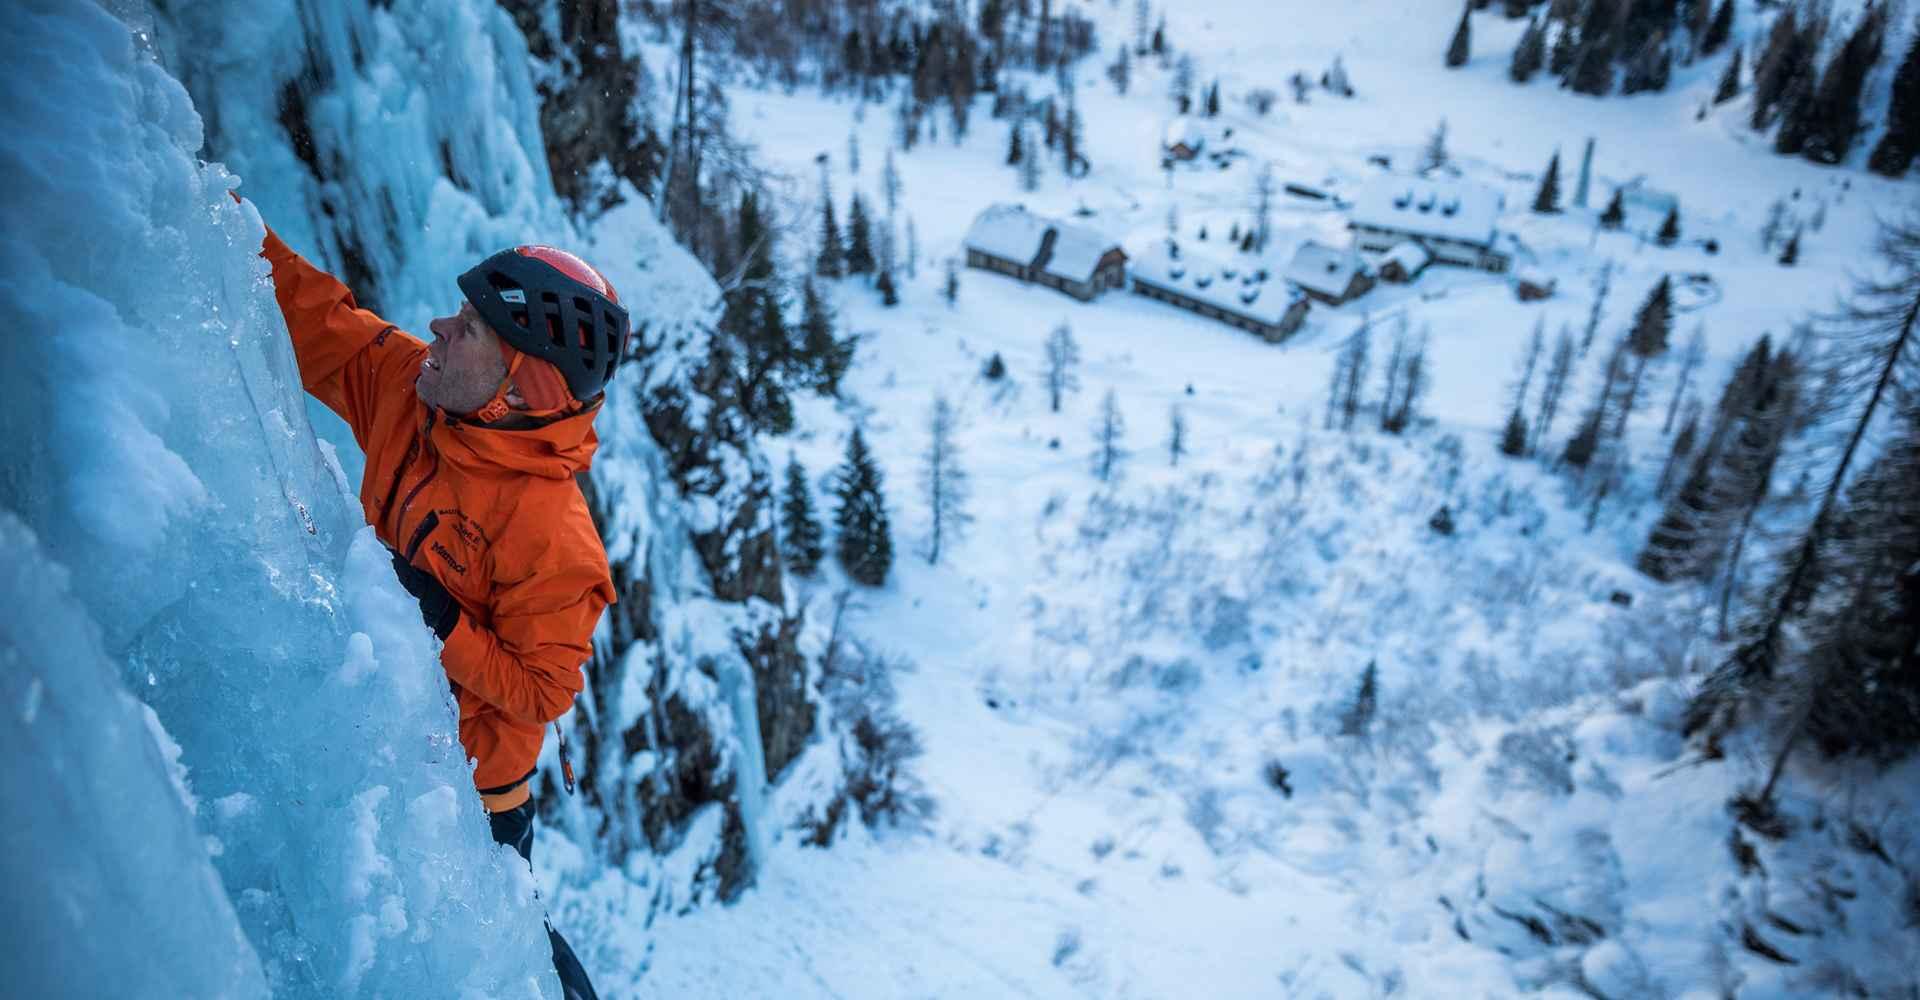 Eisklettern Markierung Produktbilder Rauris Robert Jasper Shooting Sonnblick lowa